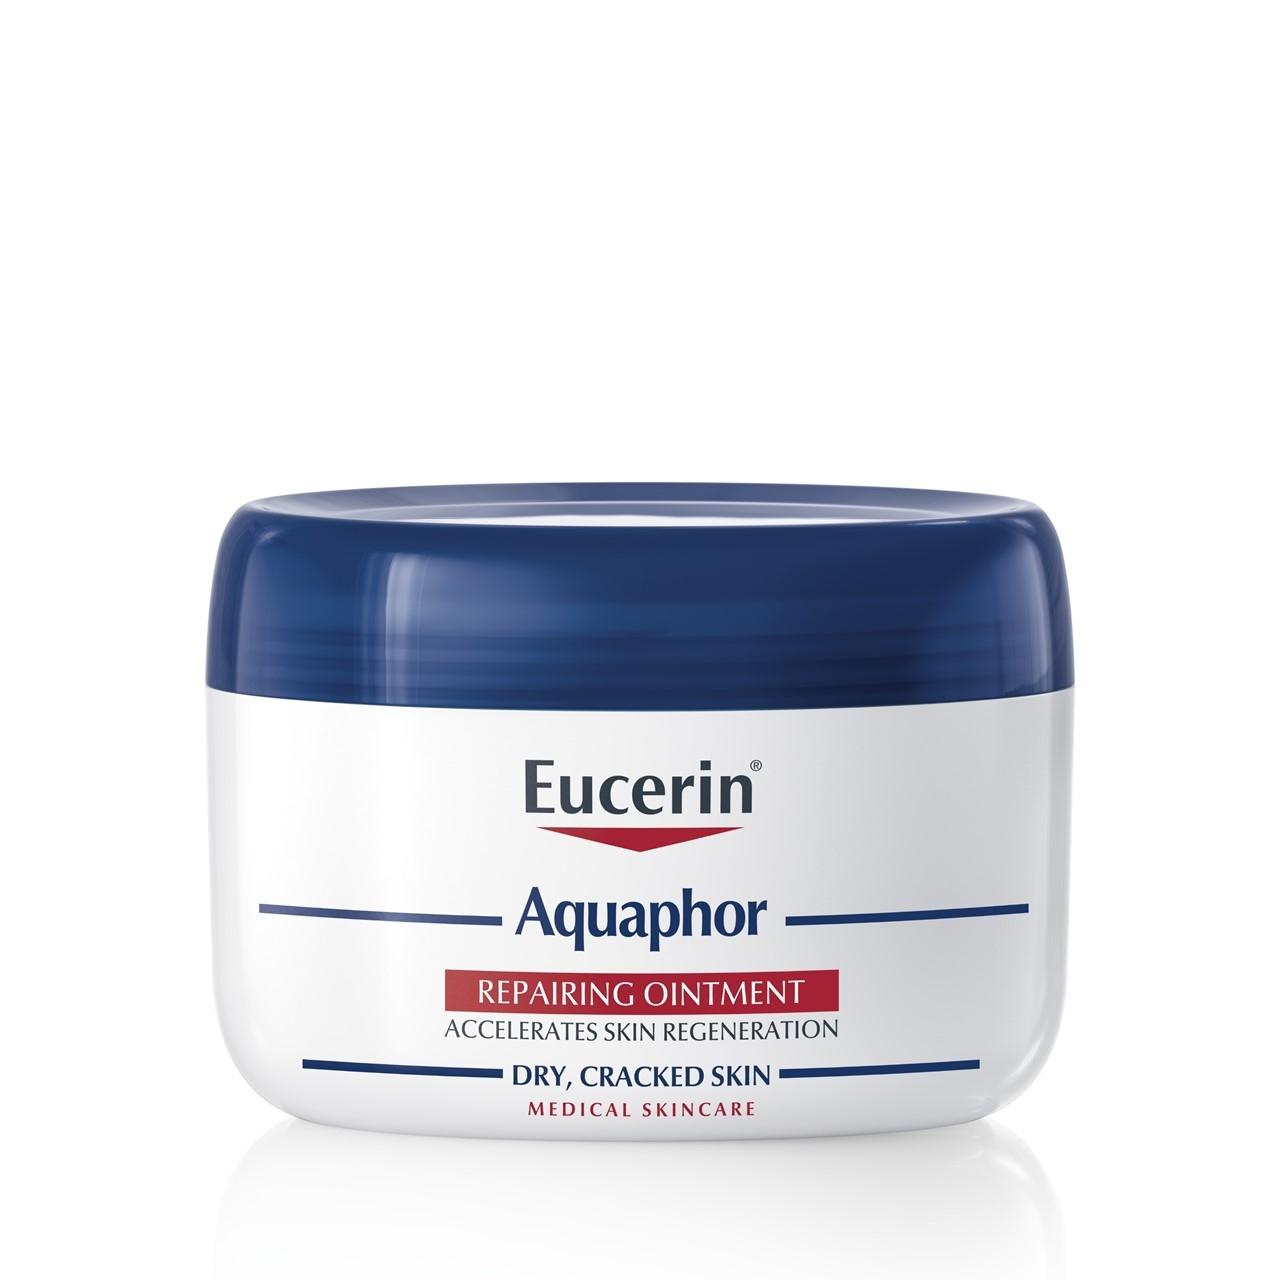 Best Eucerin Products: Eucerin Aquaphor Repairing Ointment 110ml